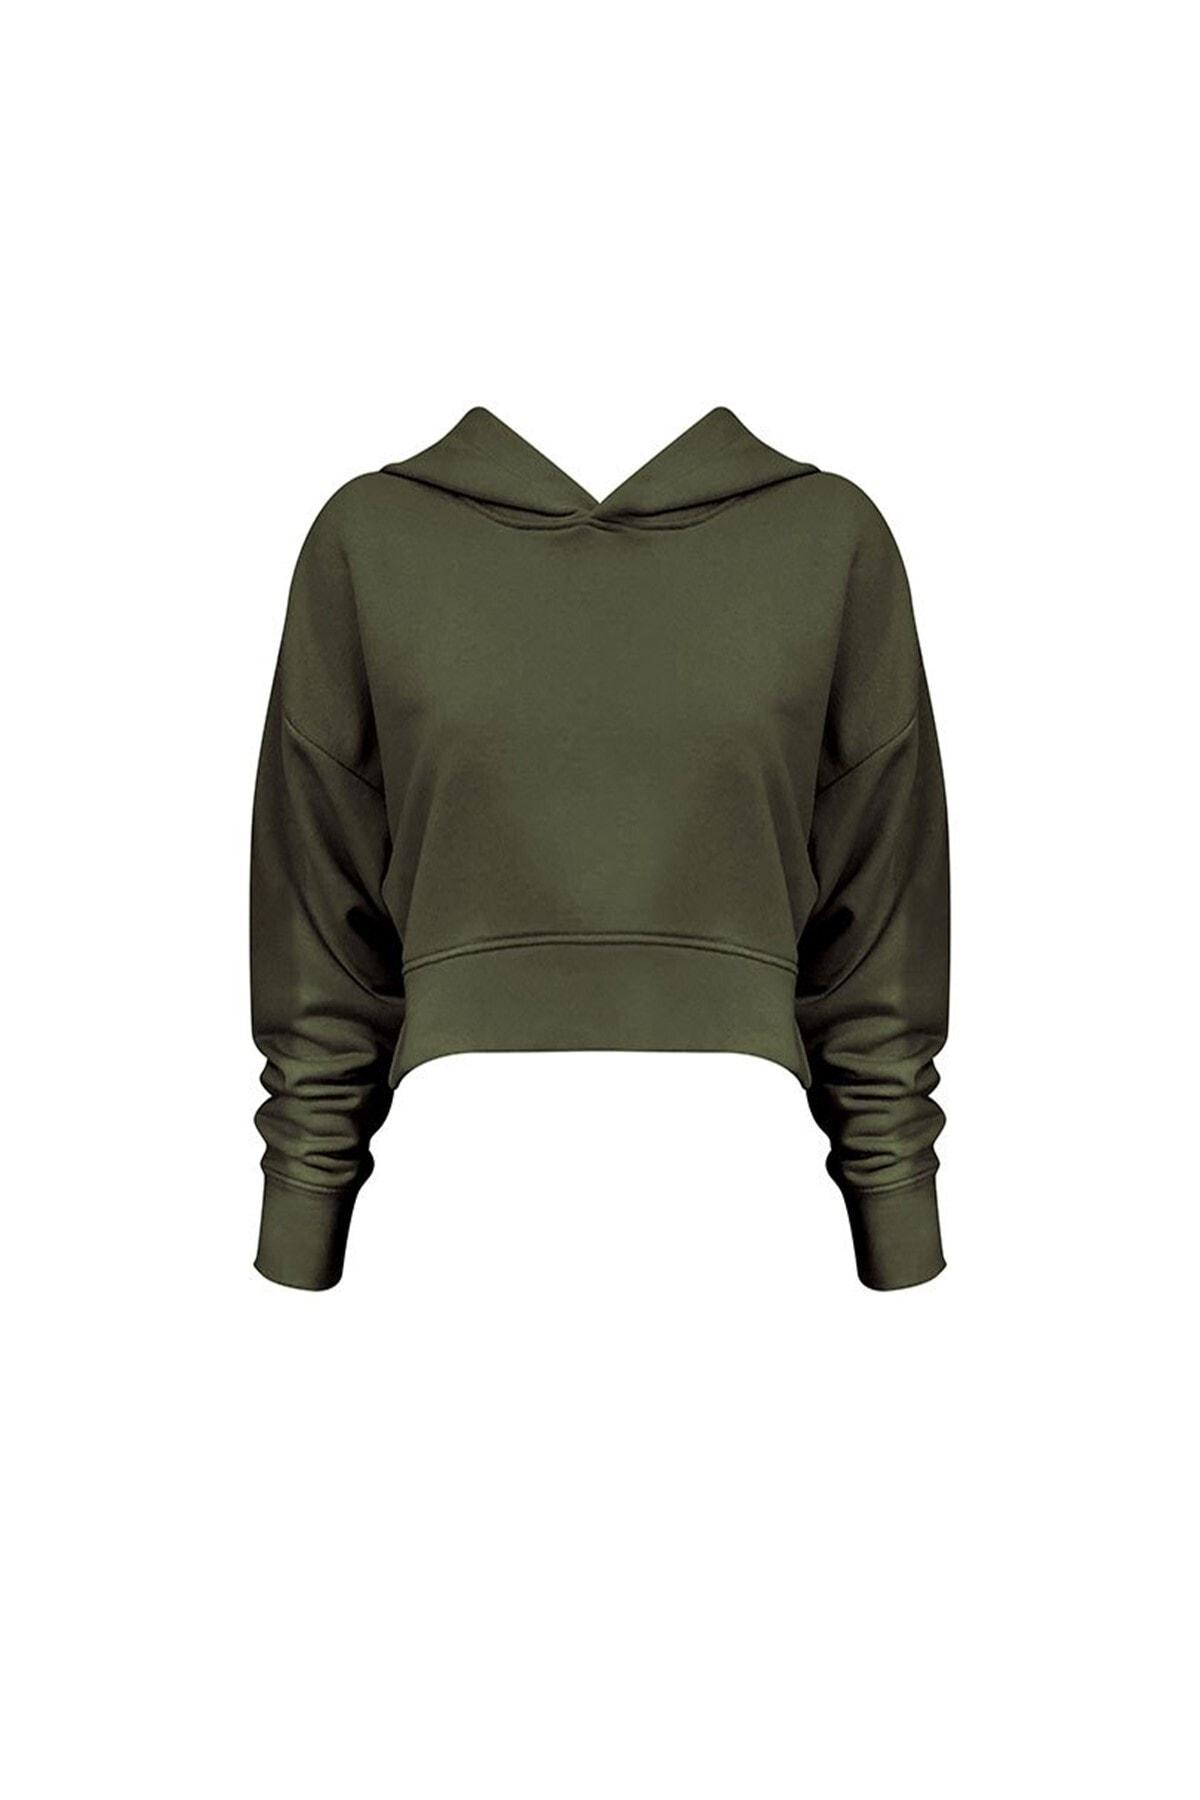 RİVUS Kapüşonlu Kısa Sweatshirt 7537